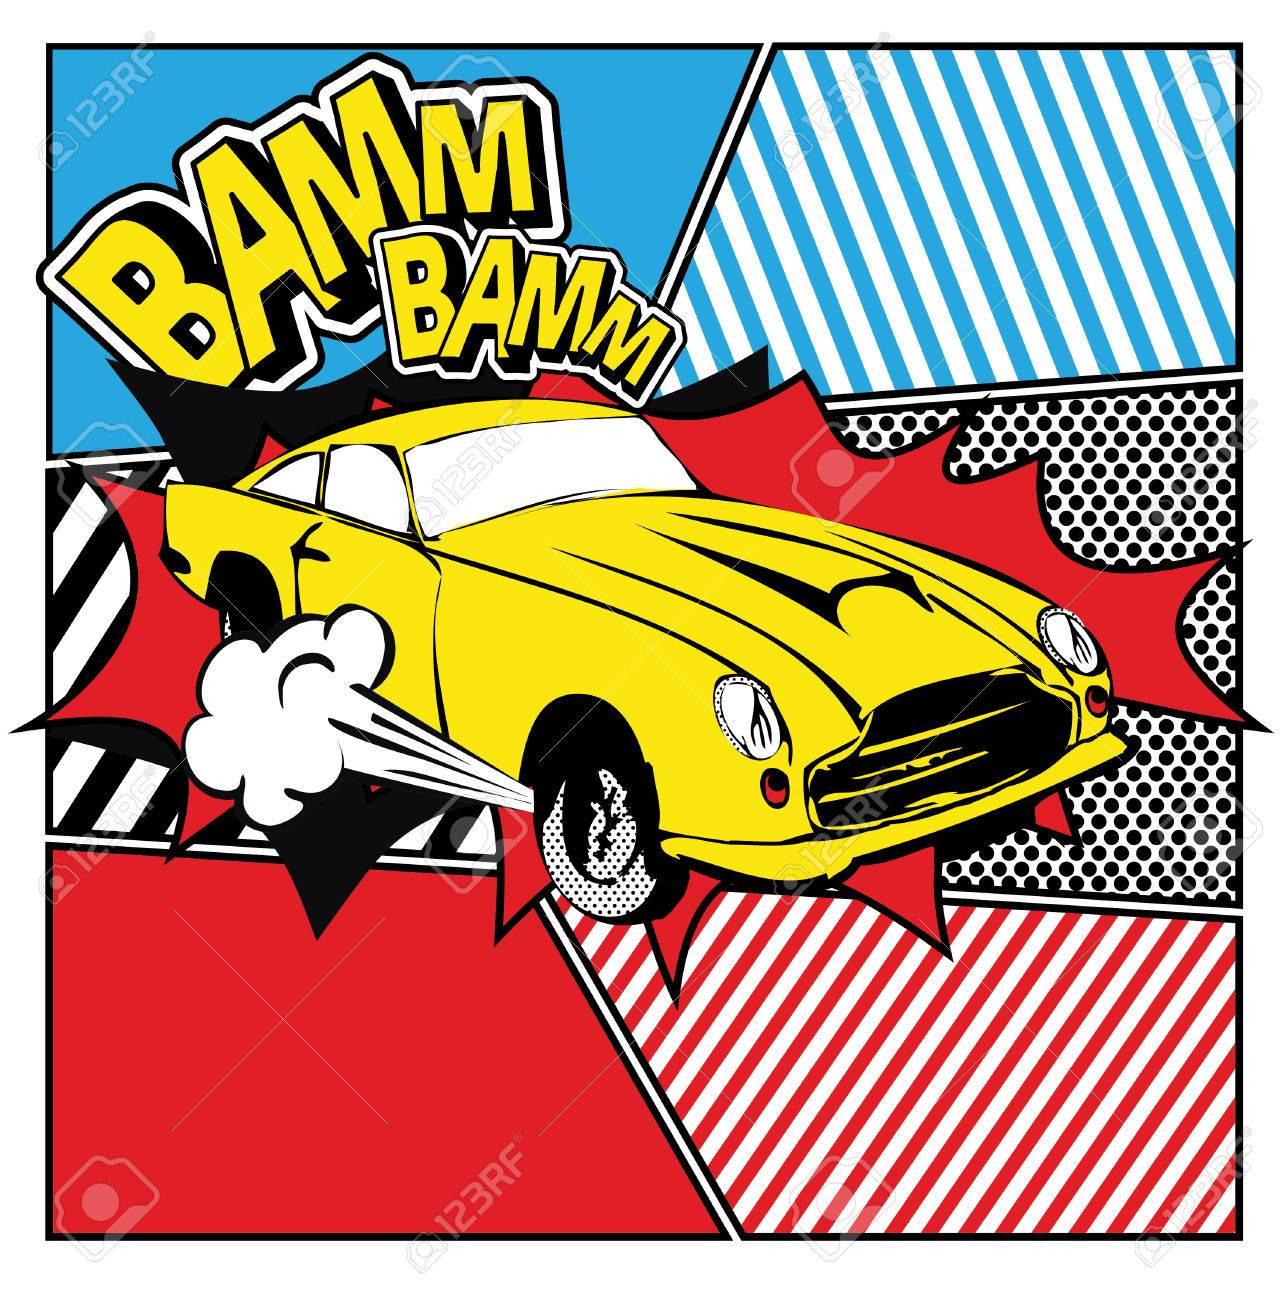 Pop art yellow car - 50939417